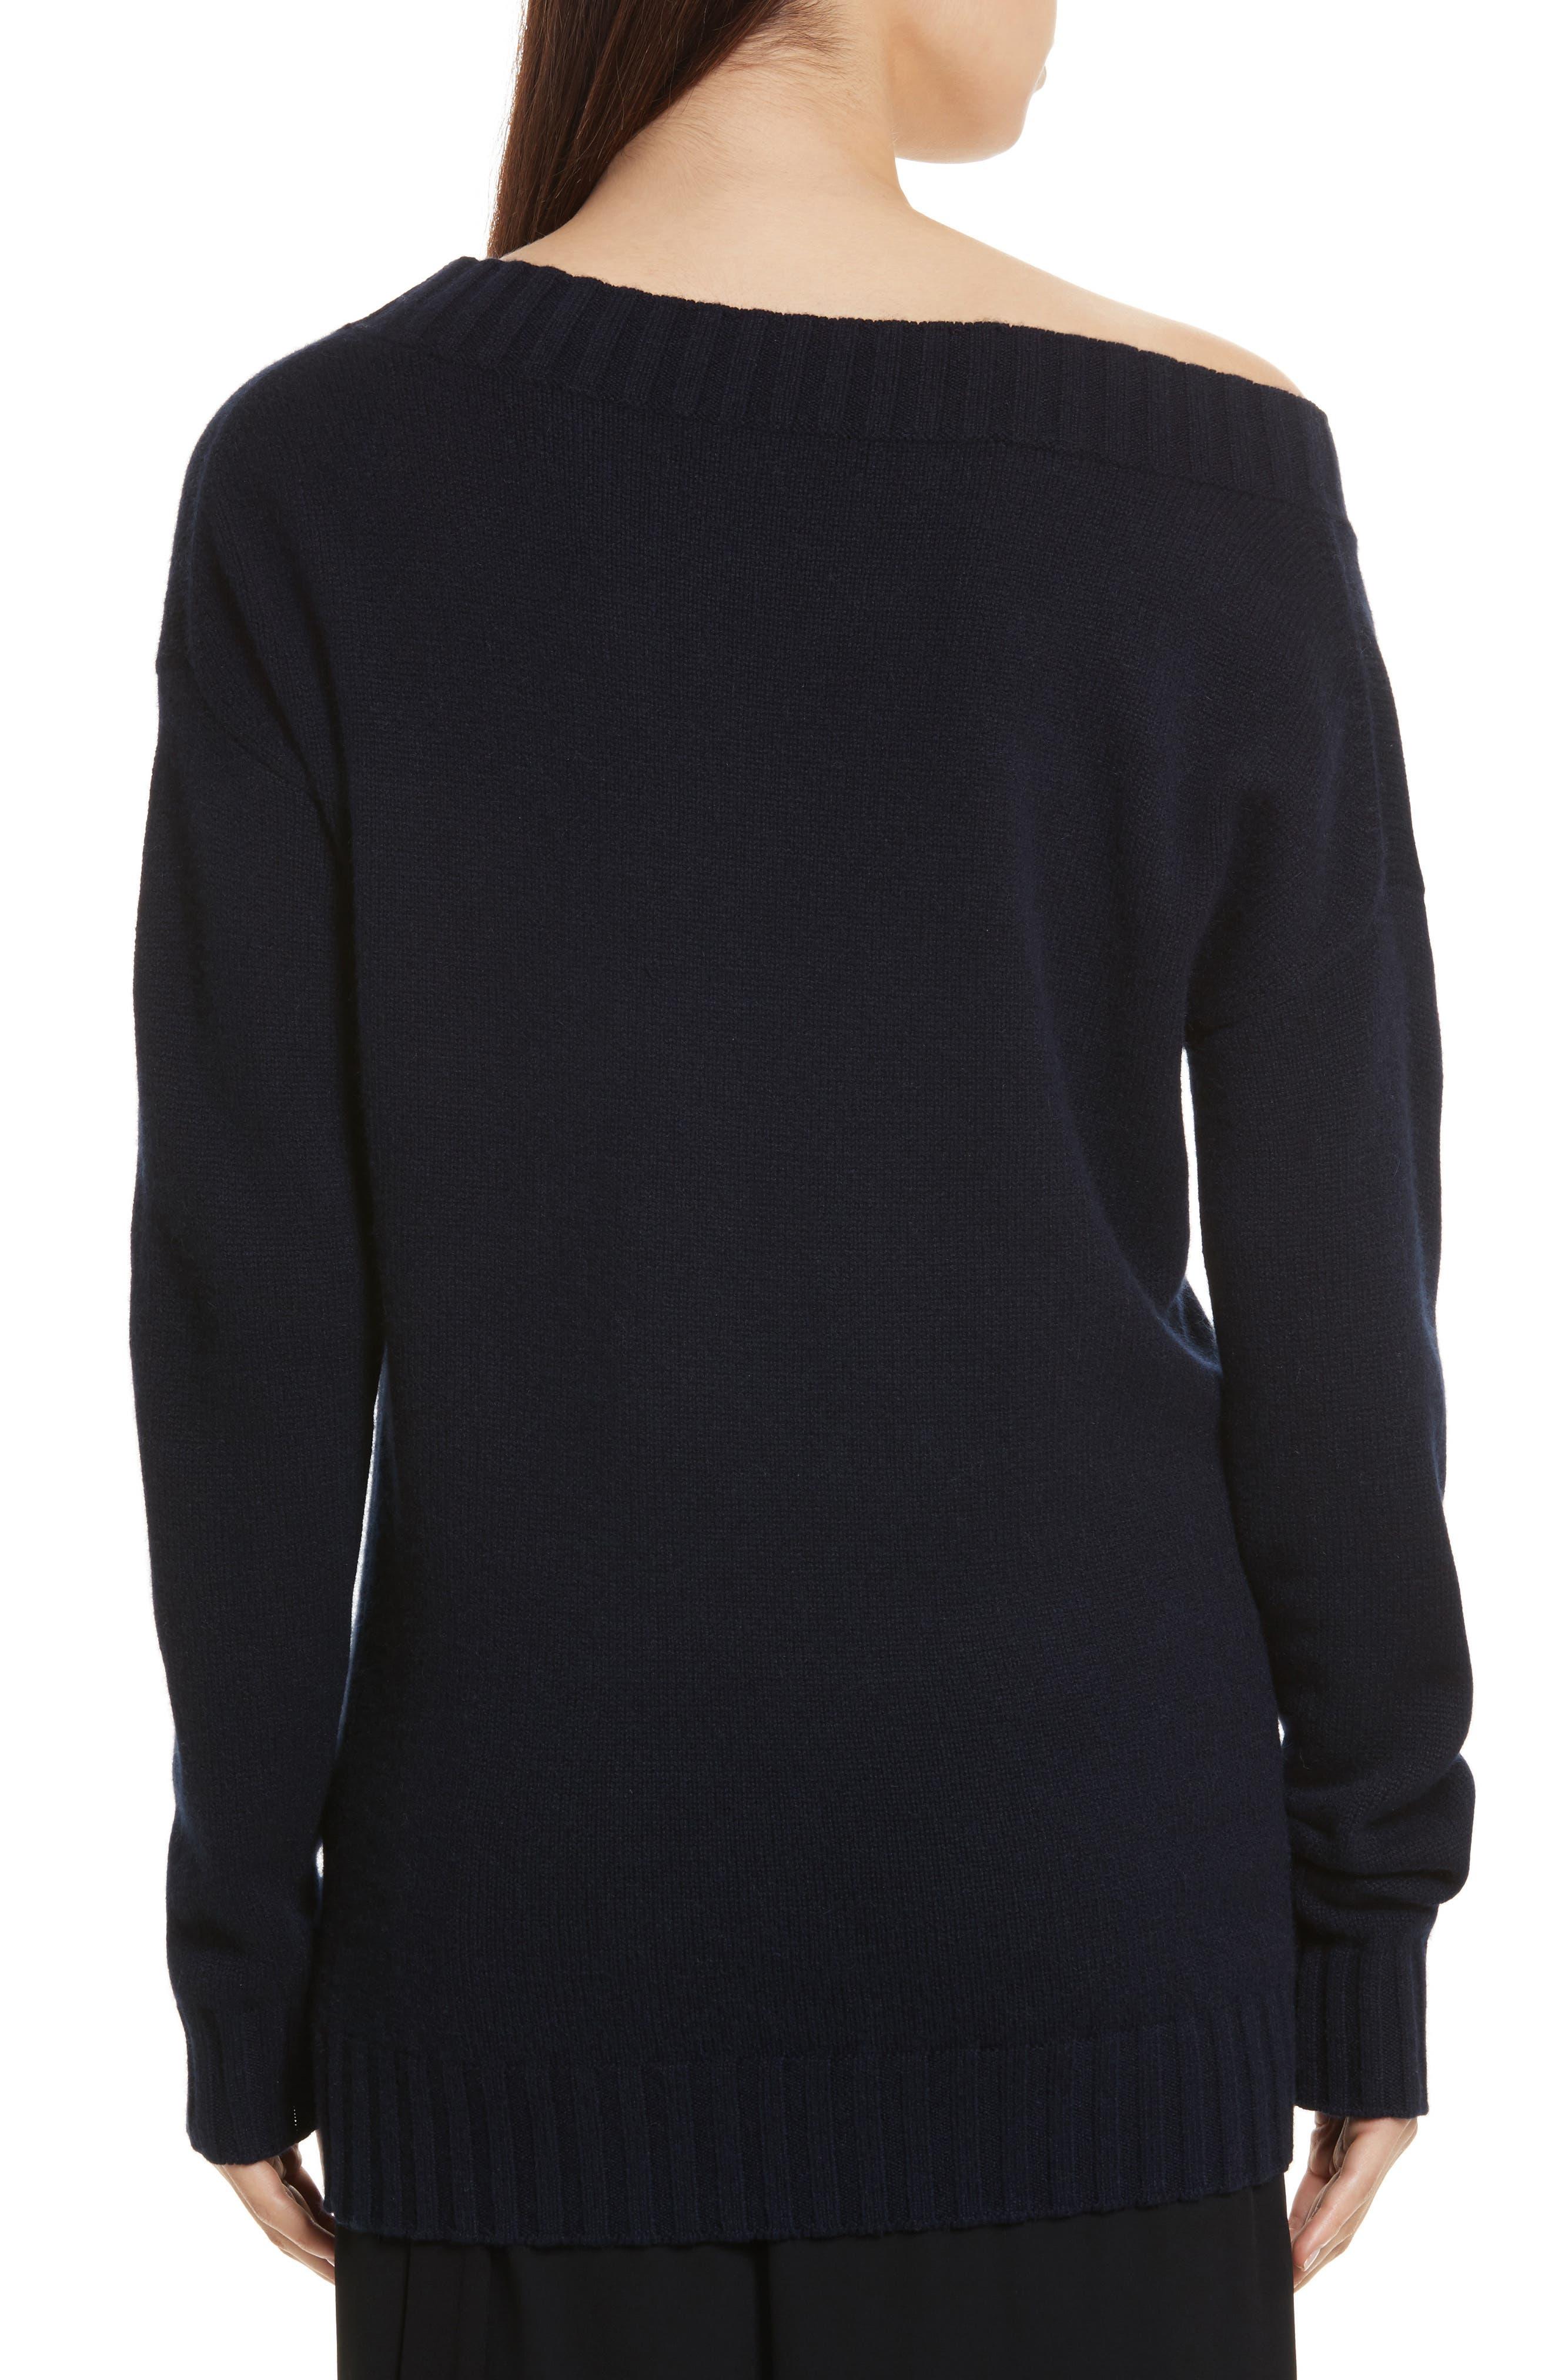 Alternate Image 2  - Vince Off the Shoulder Wool & Cashmere Sweater